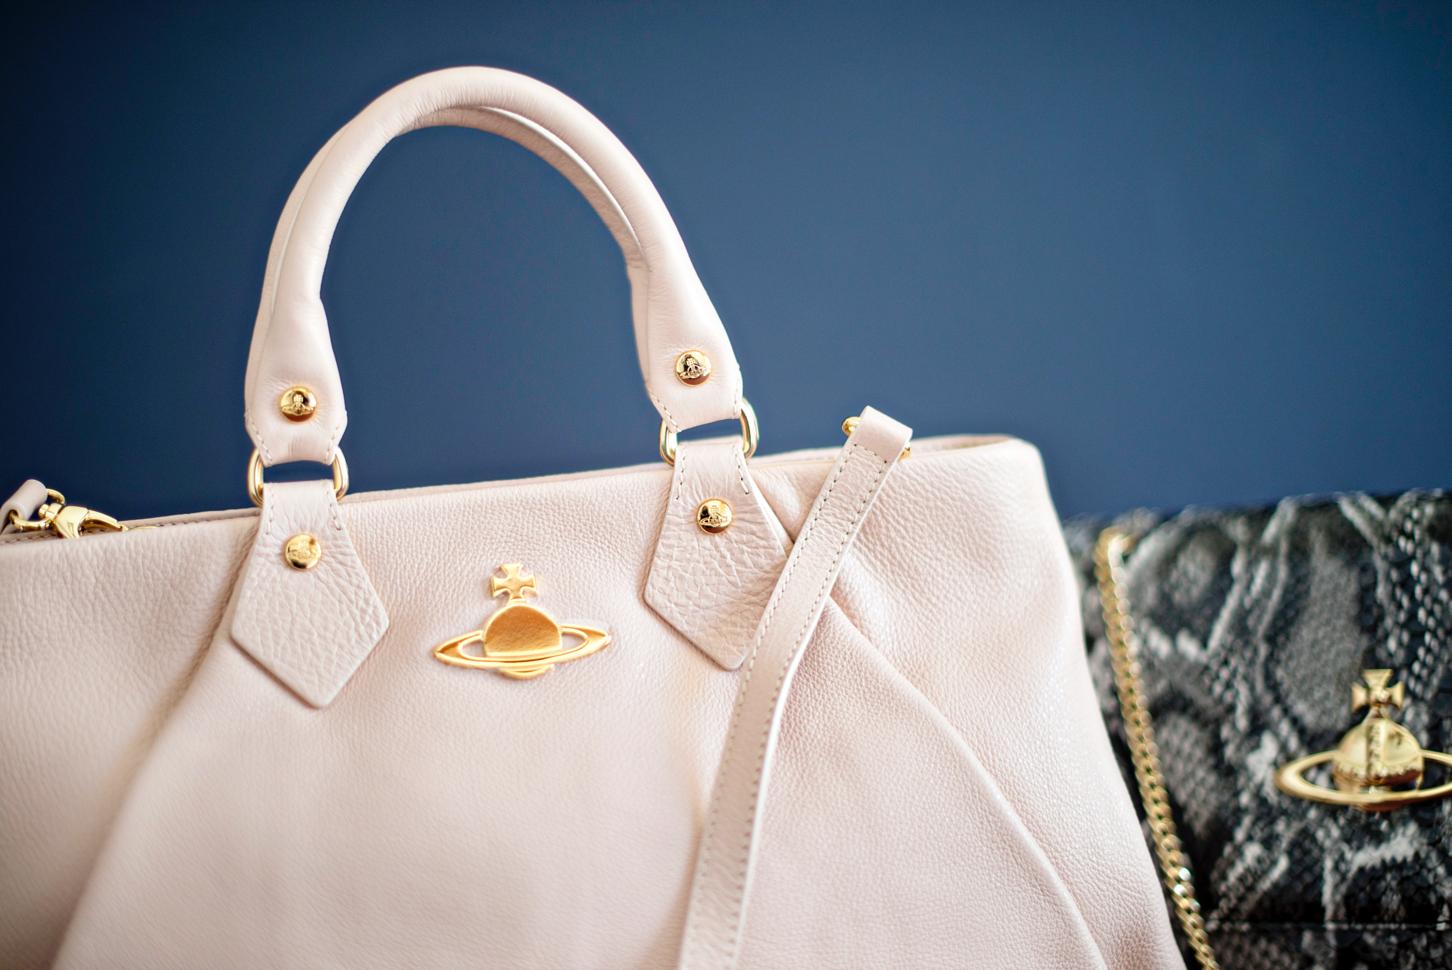 White Designer Tote Handbag